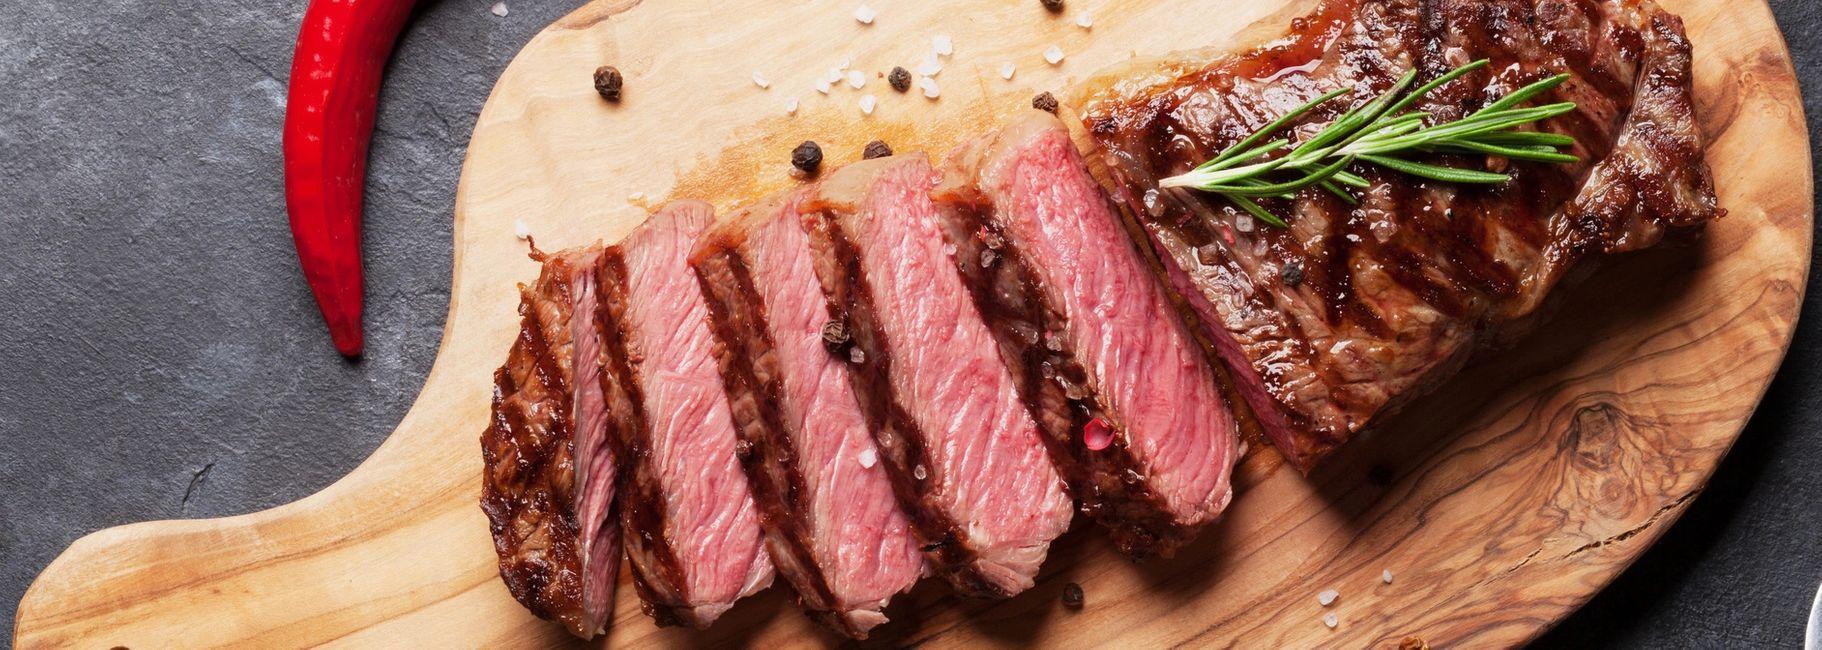 Lemon & Garlic Marinated Flat Iron Steak